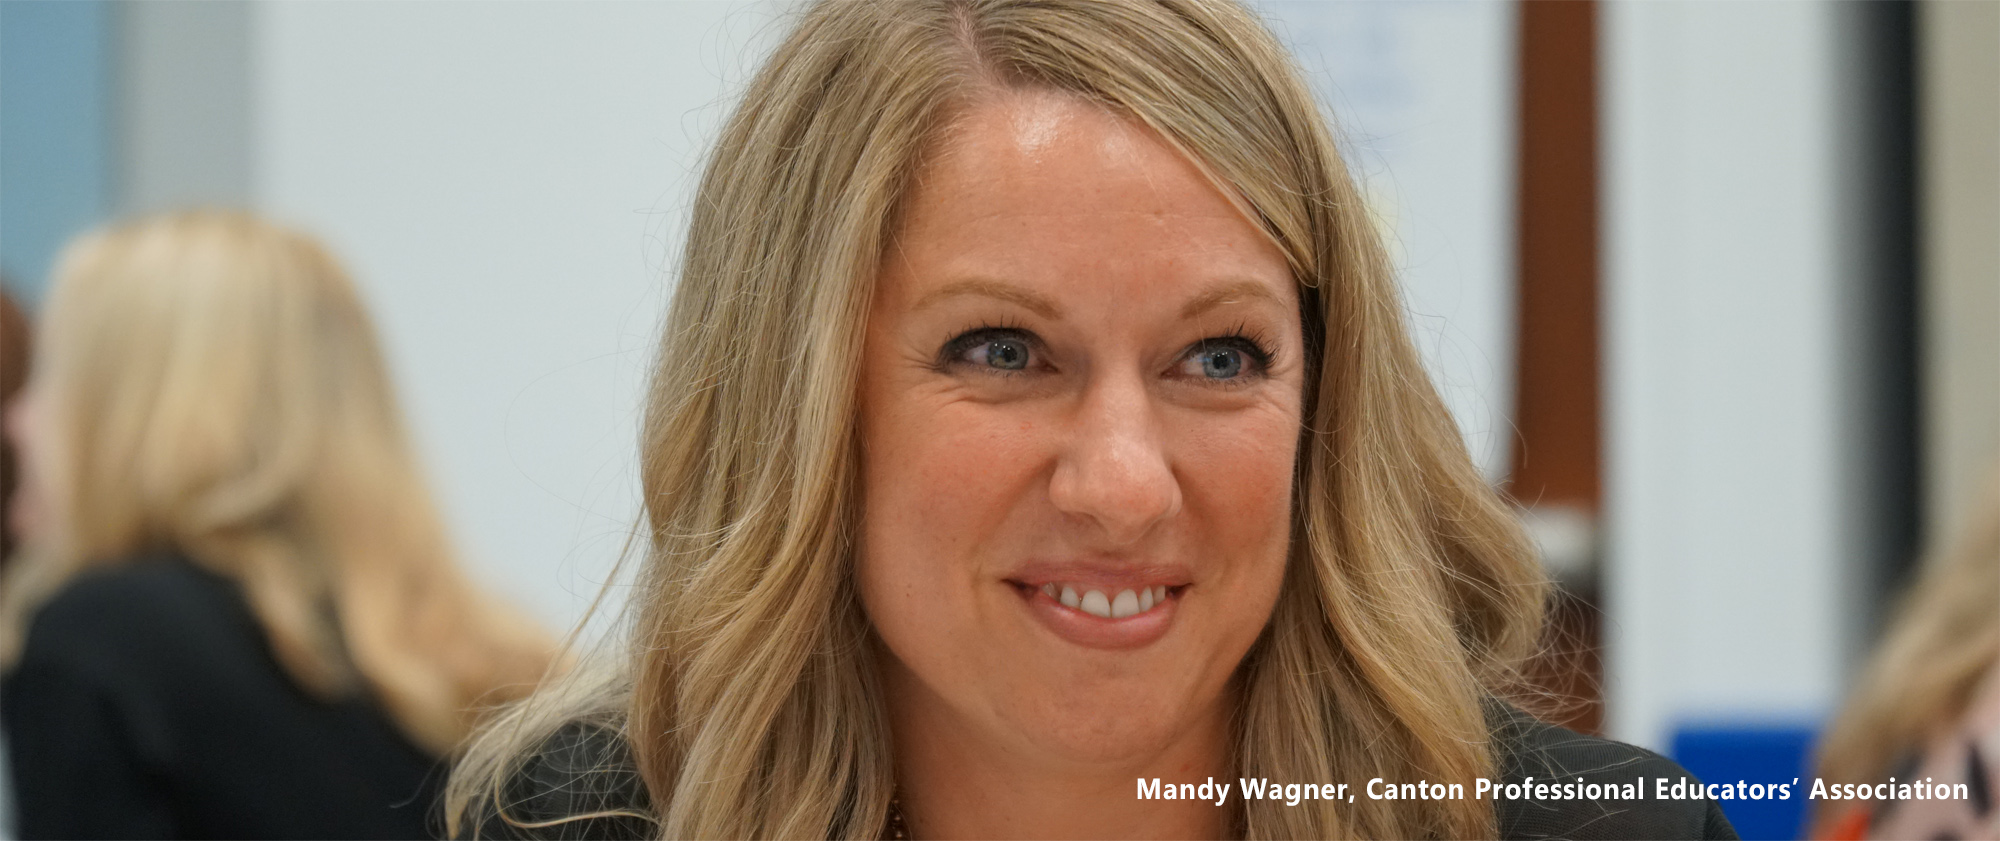 Image: Mandy Wagner, Canton Professional Educators' Association